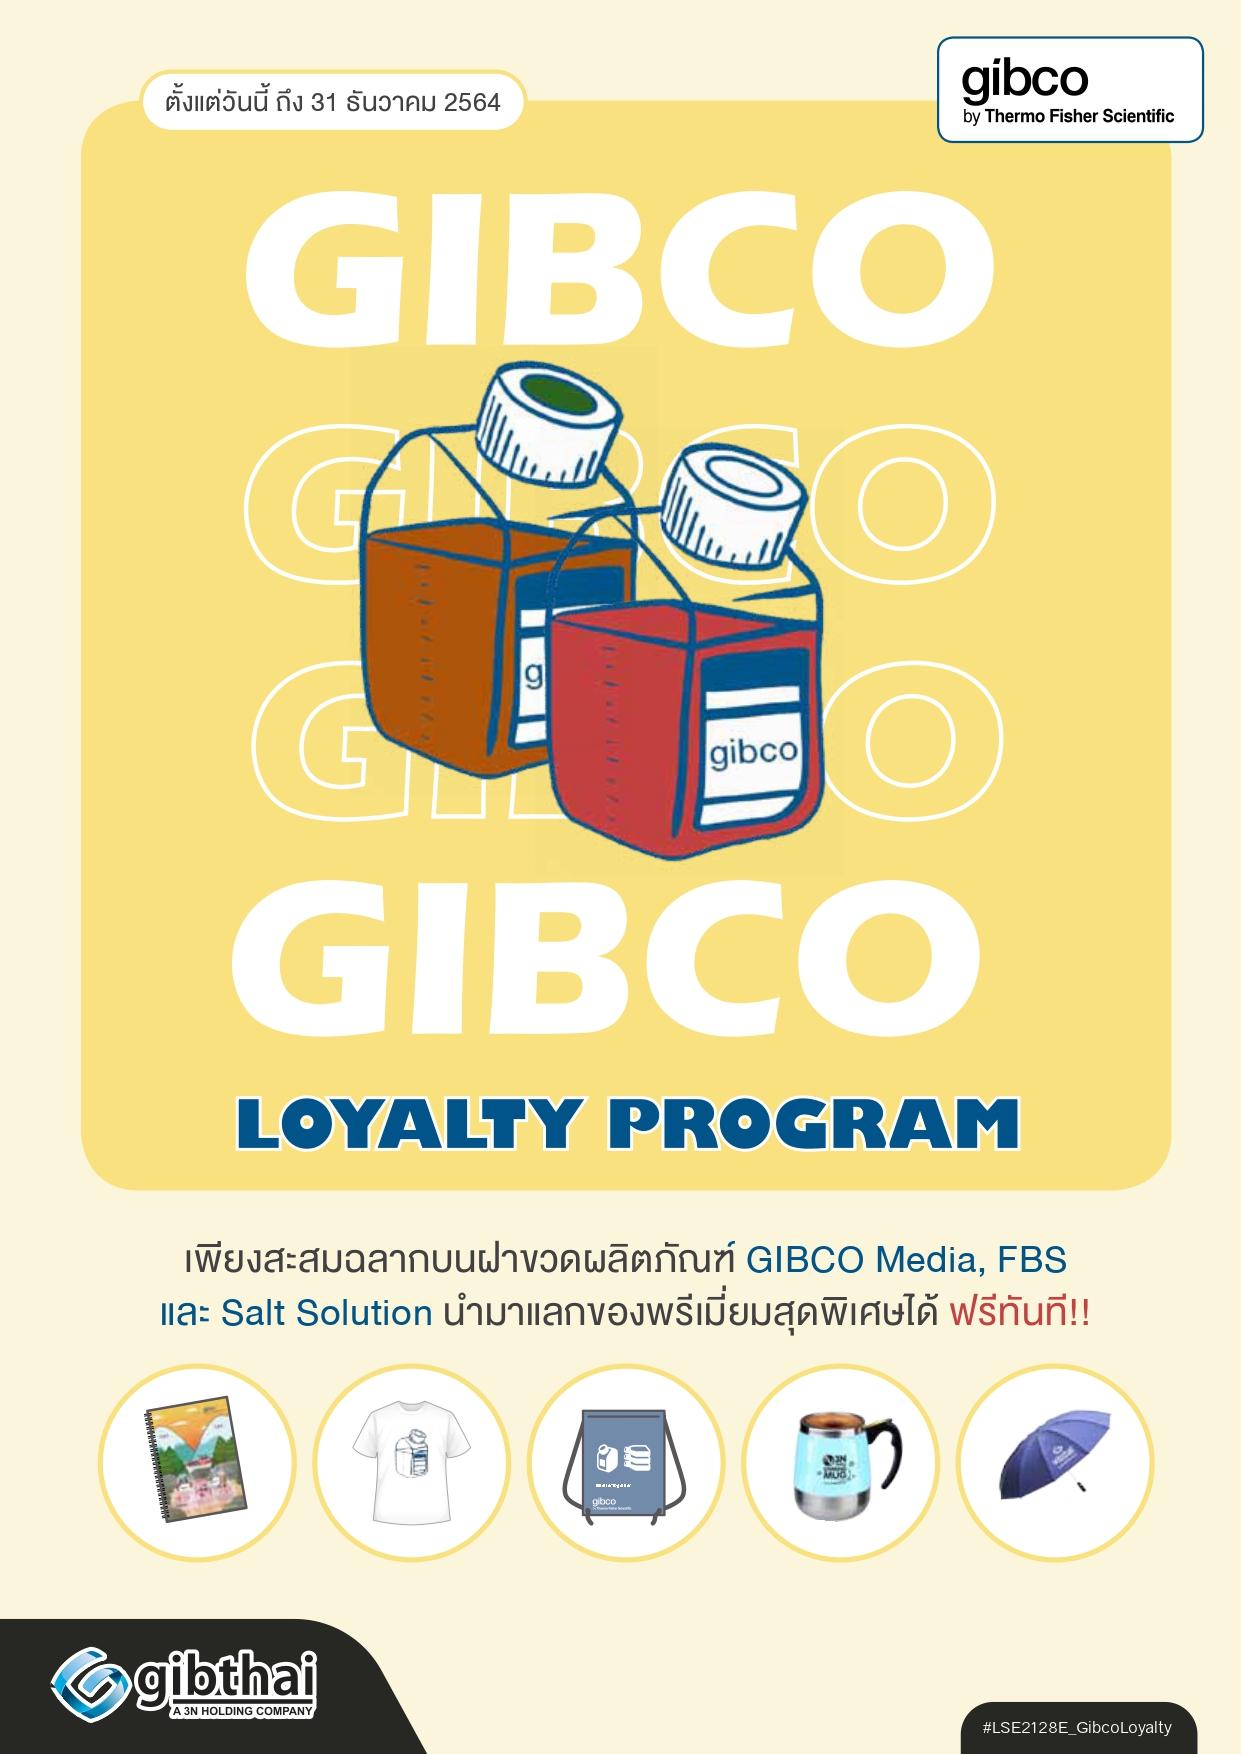 Gibco Loyalty Program